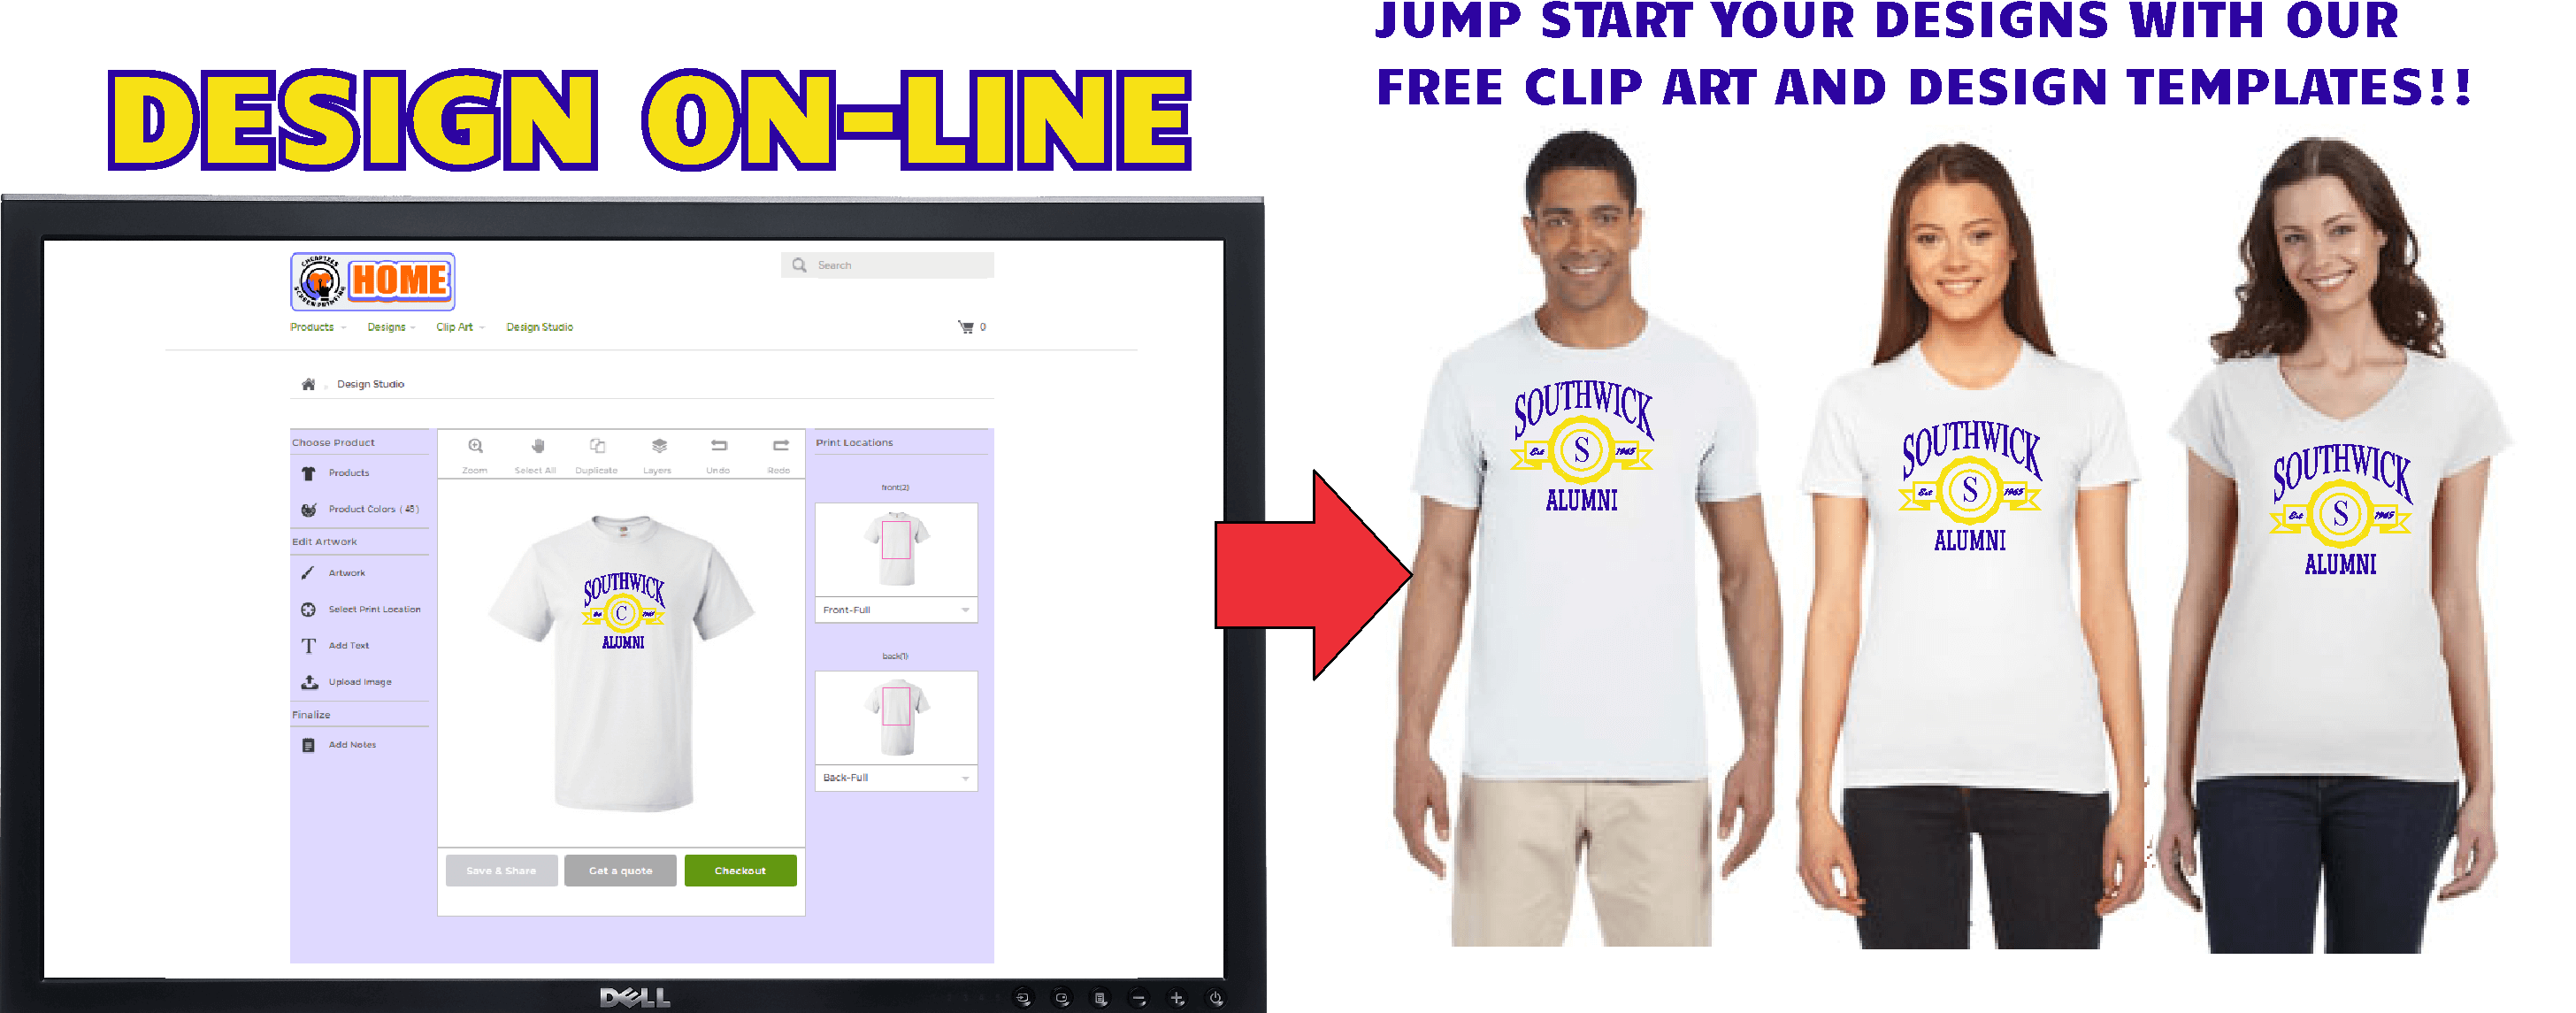 Screen printer in southwick. Clipart shirt school shirt